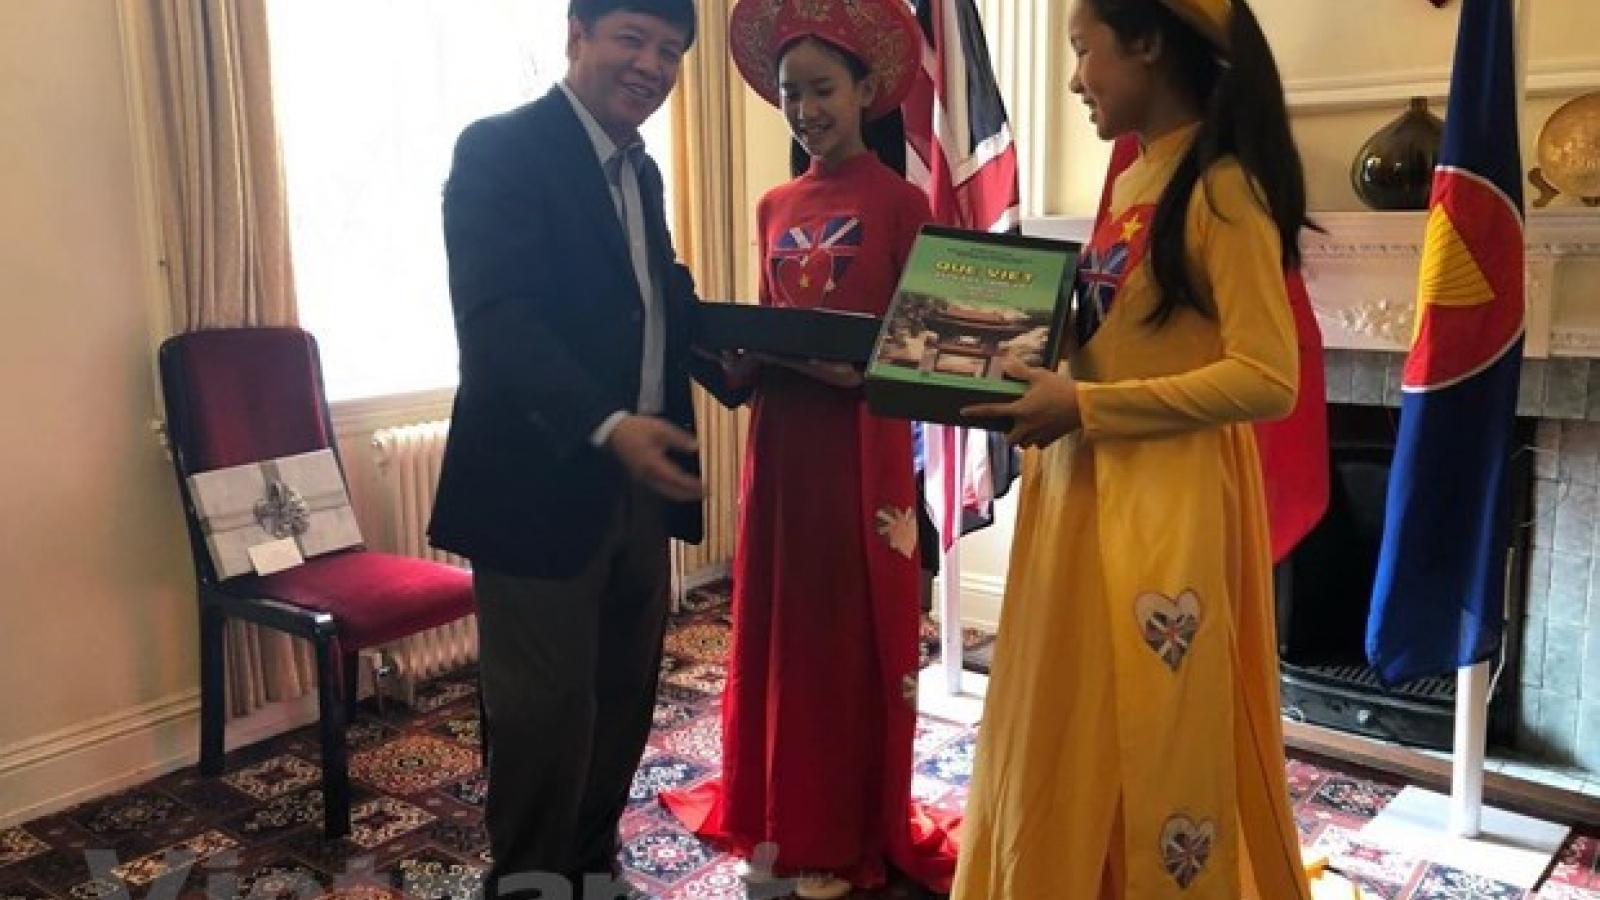 Officials on Overseas Vietnamese Affairs visit UK